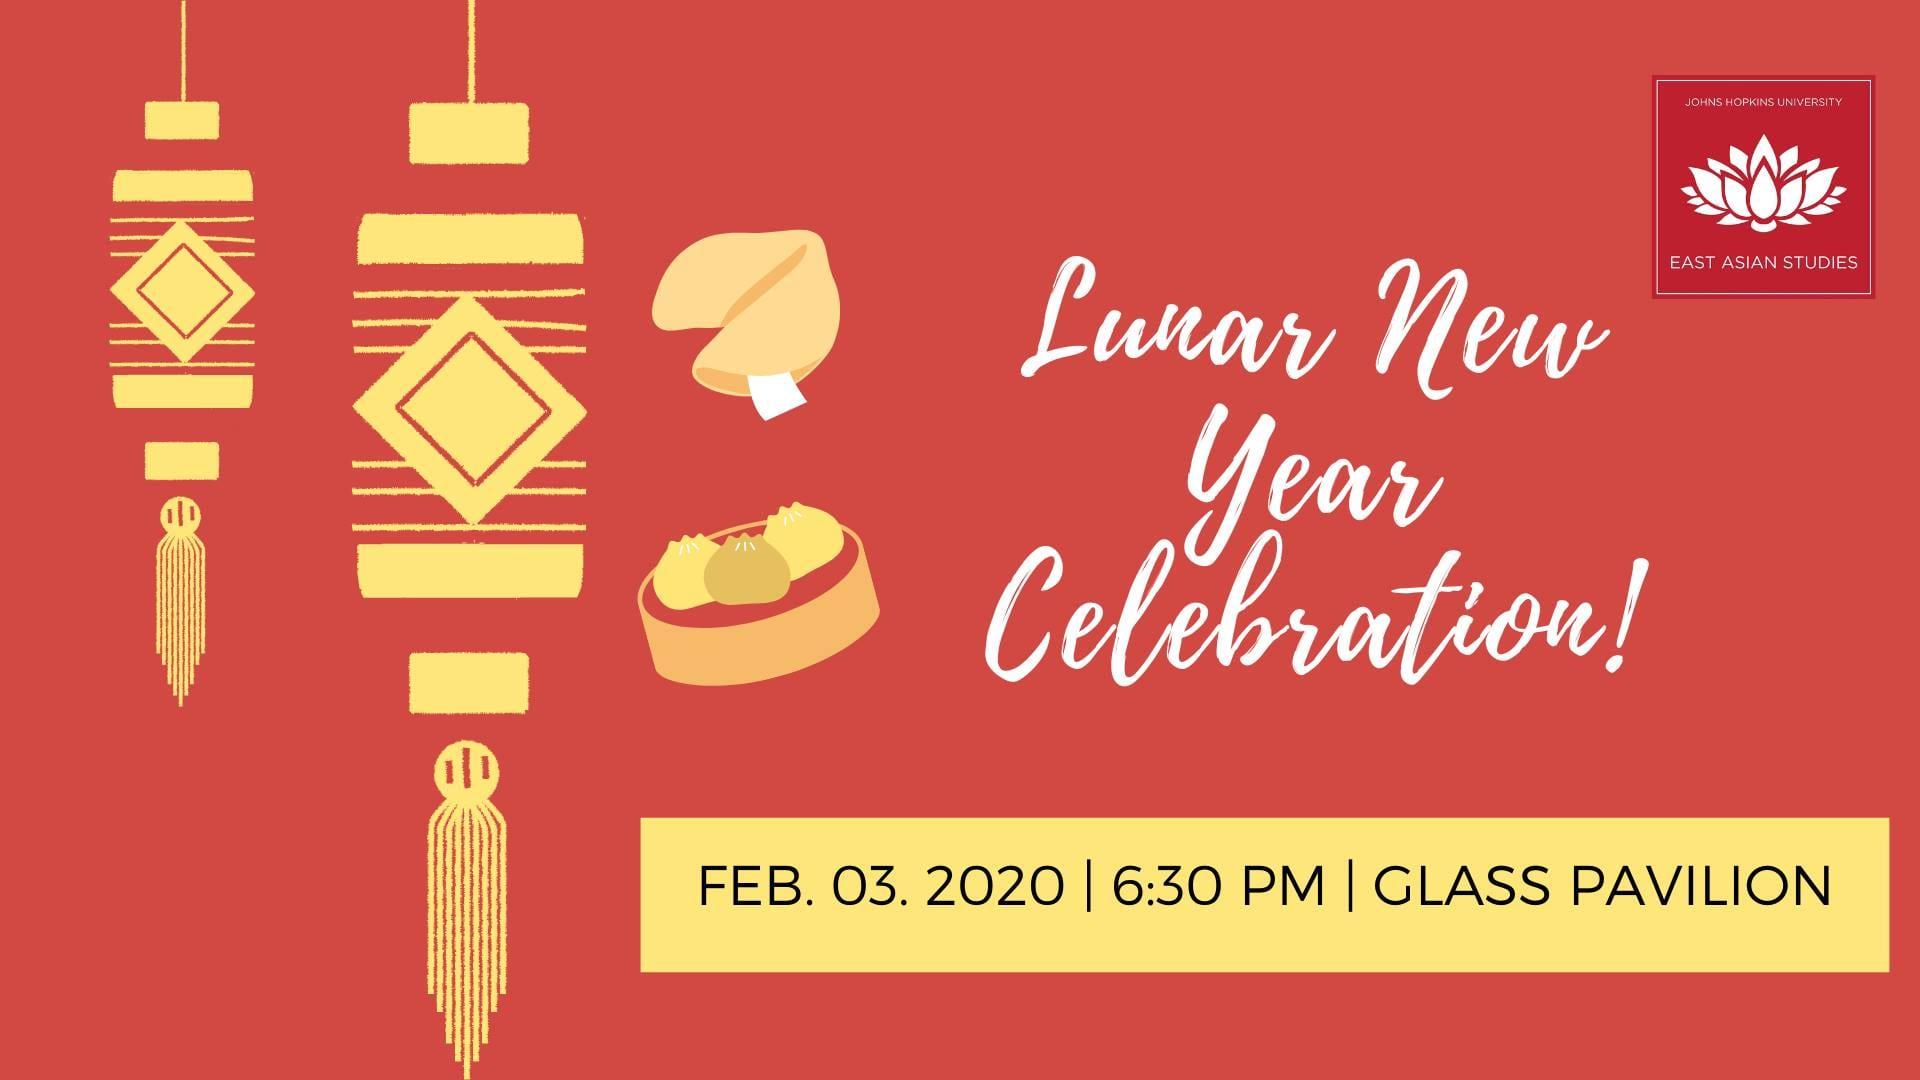 East Asian Studies Lunar New Year 2020!